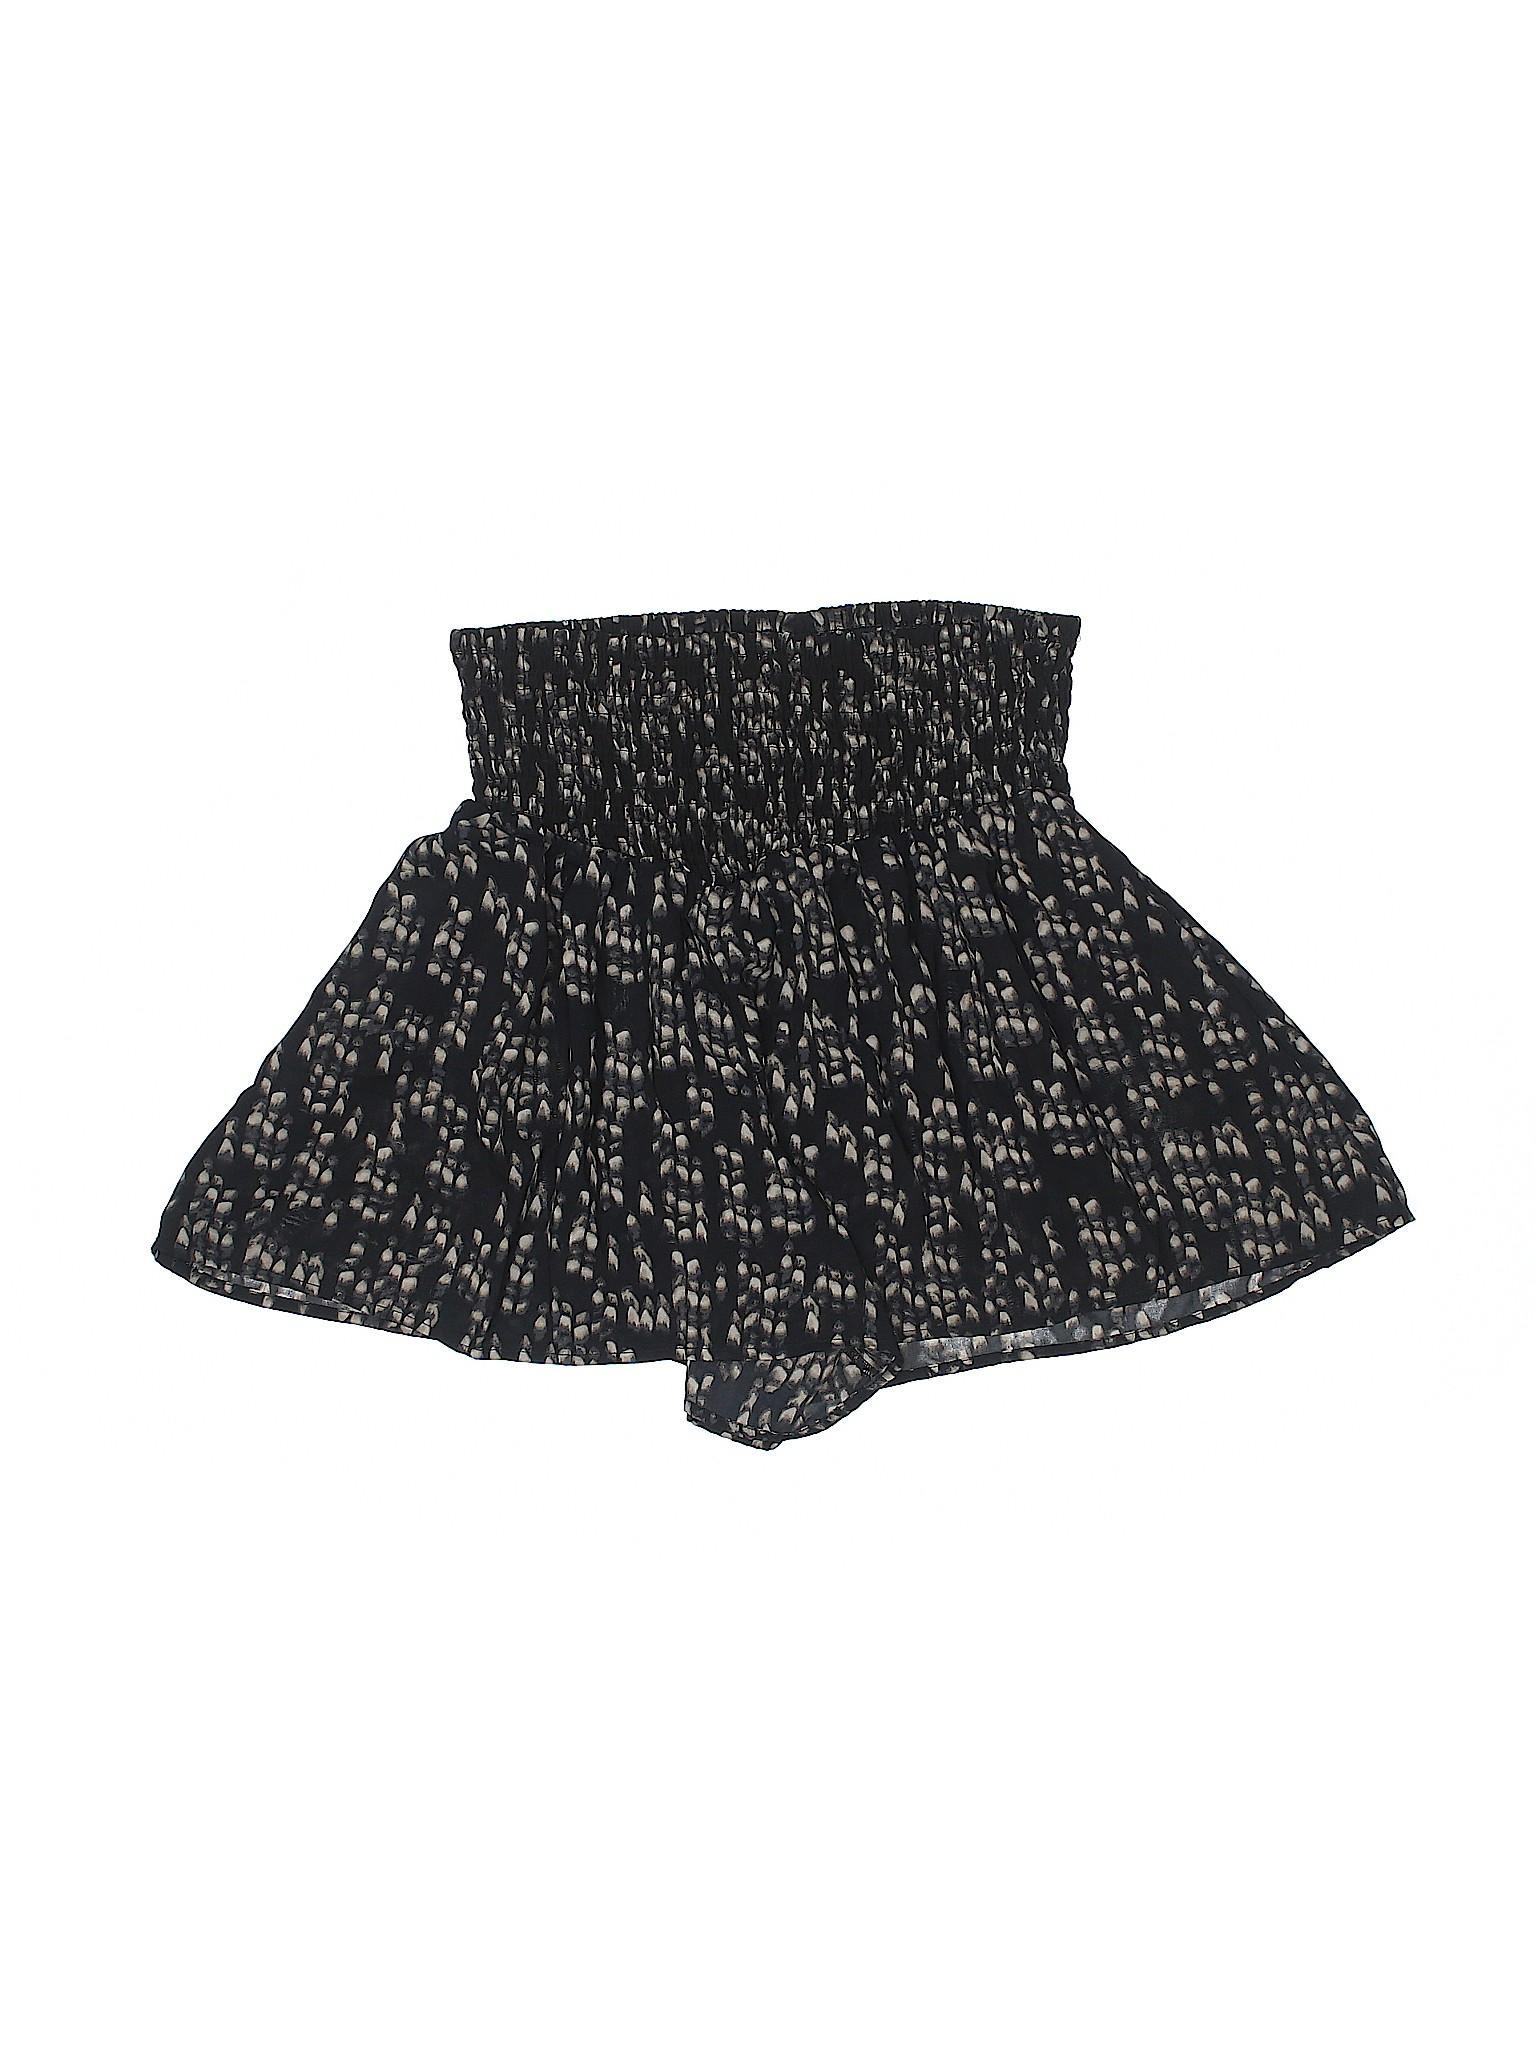 Shorts Boutique Star winter Converse One qcwHFgXxP